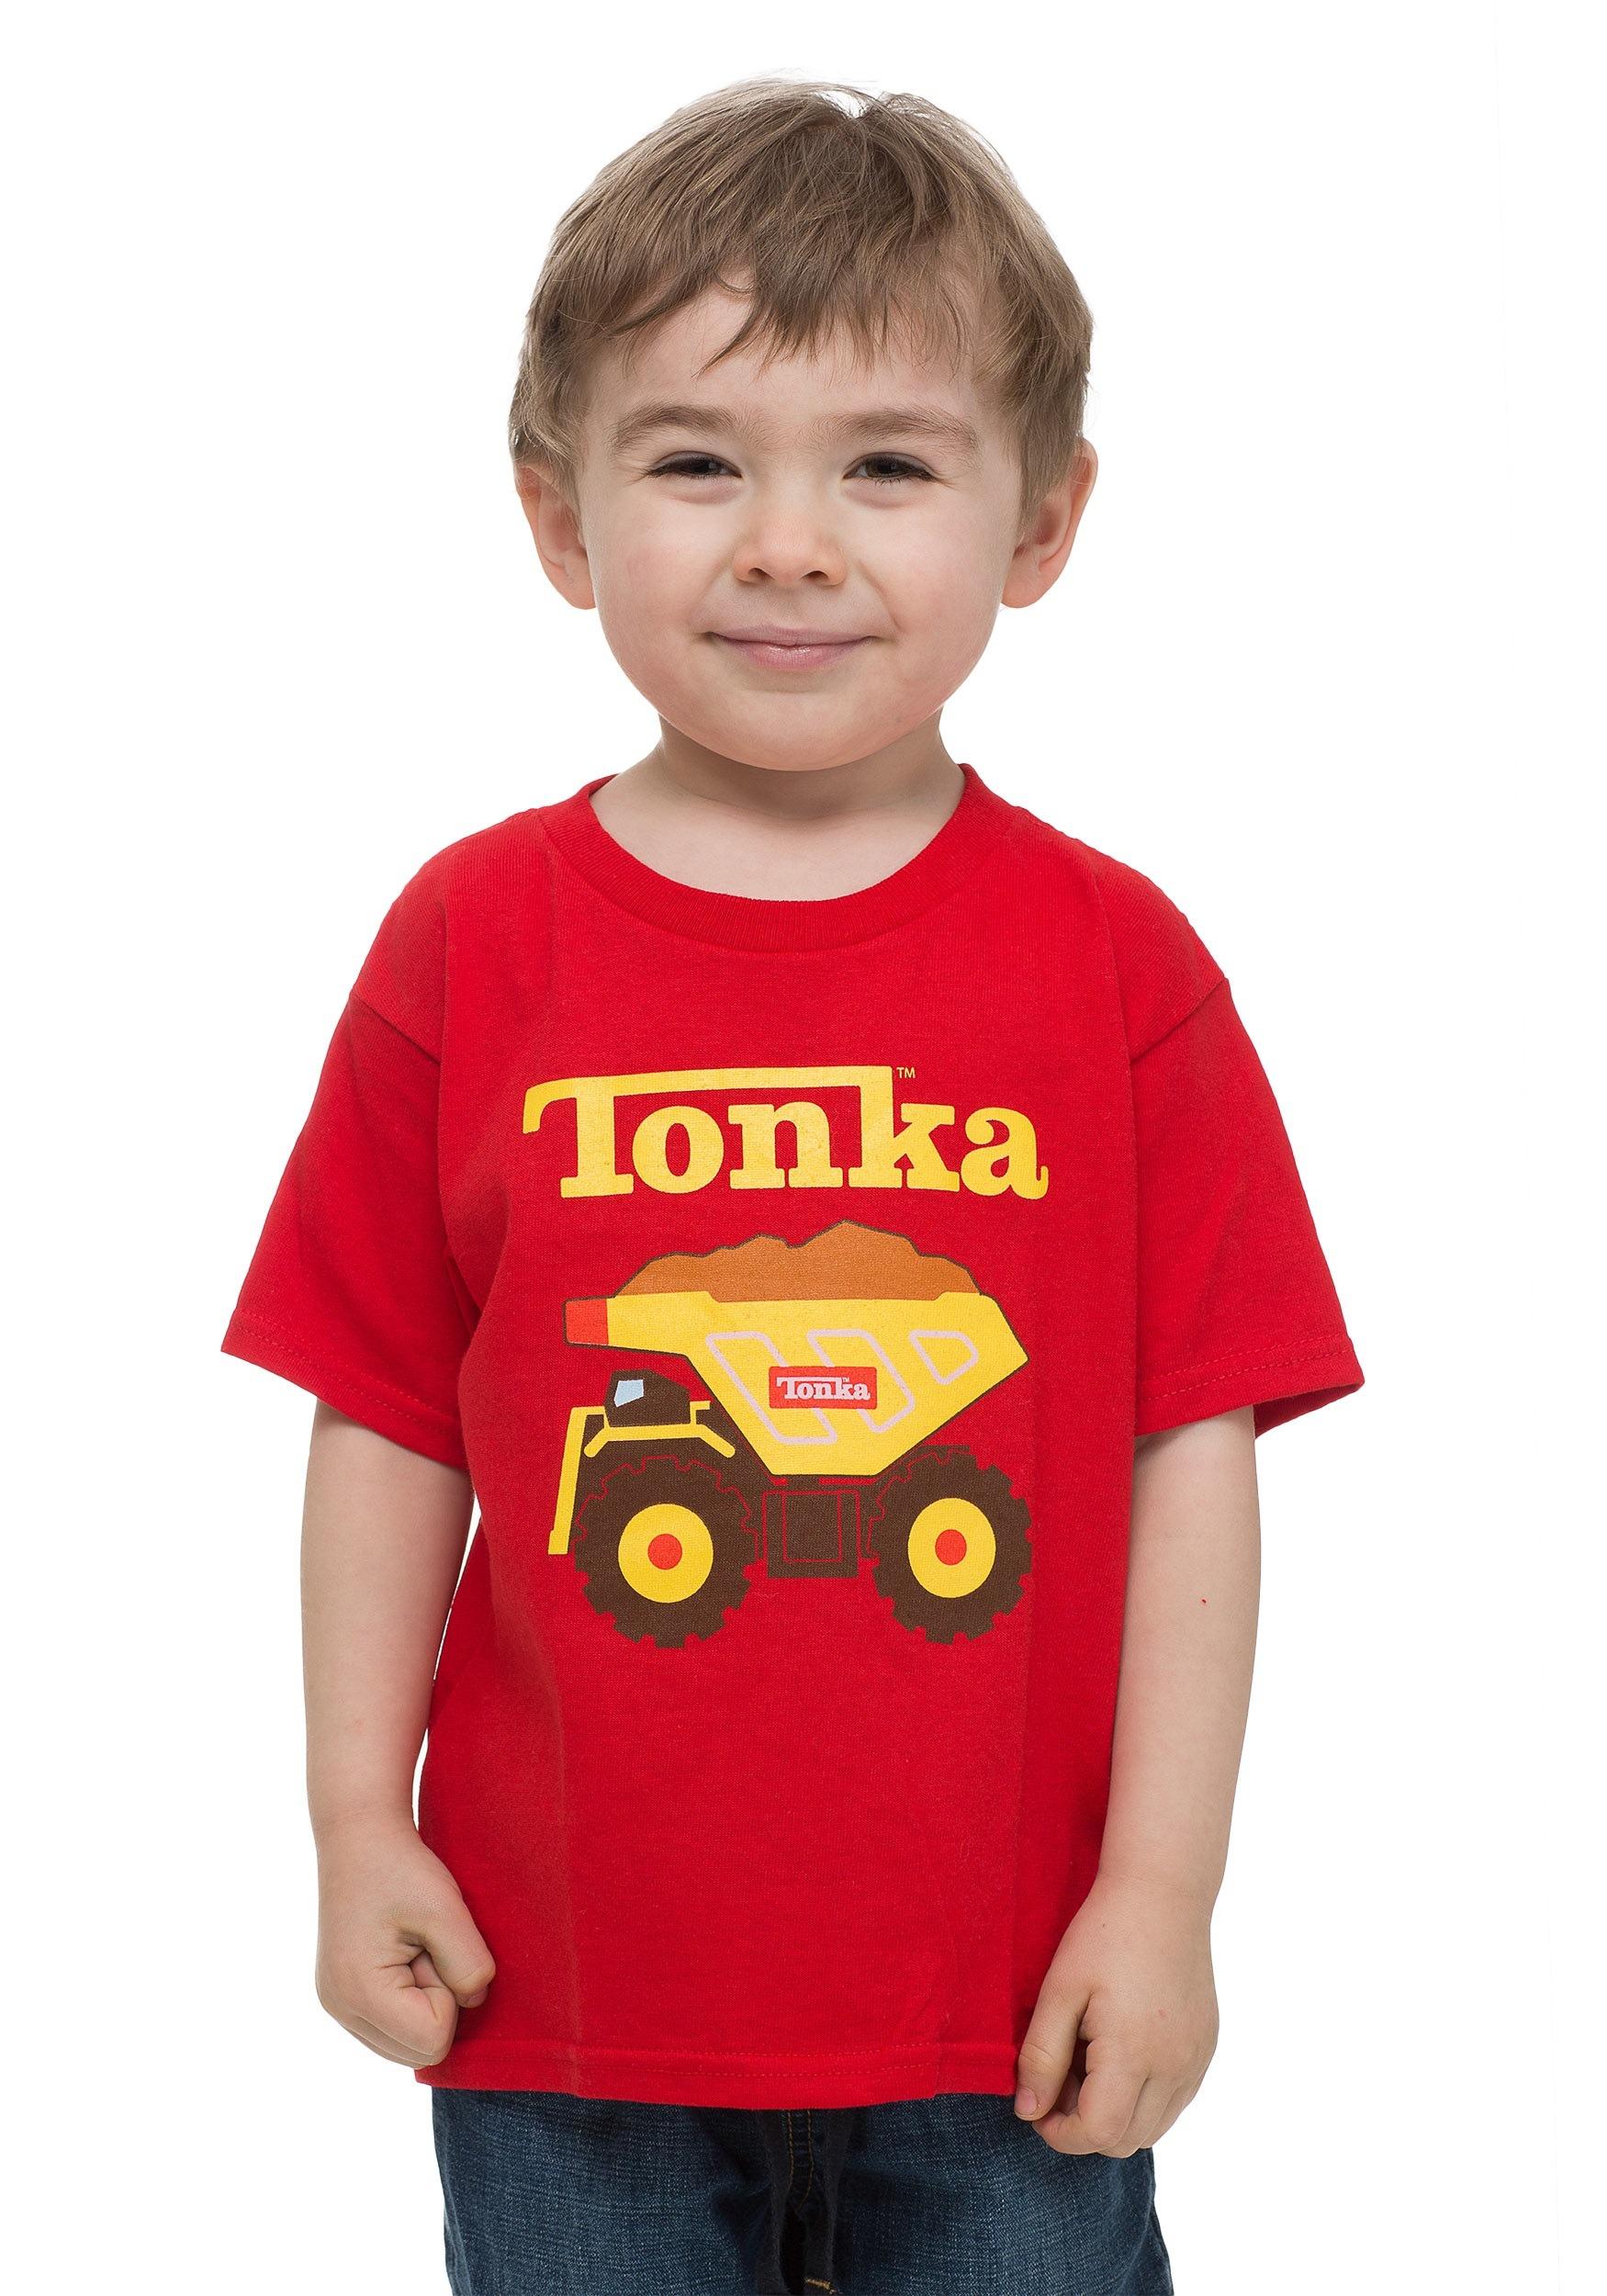 Toddler Tonka Truck Red T-Shirt FZKOSB001TD